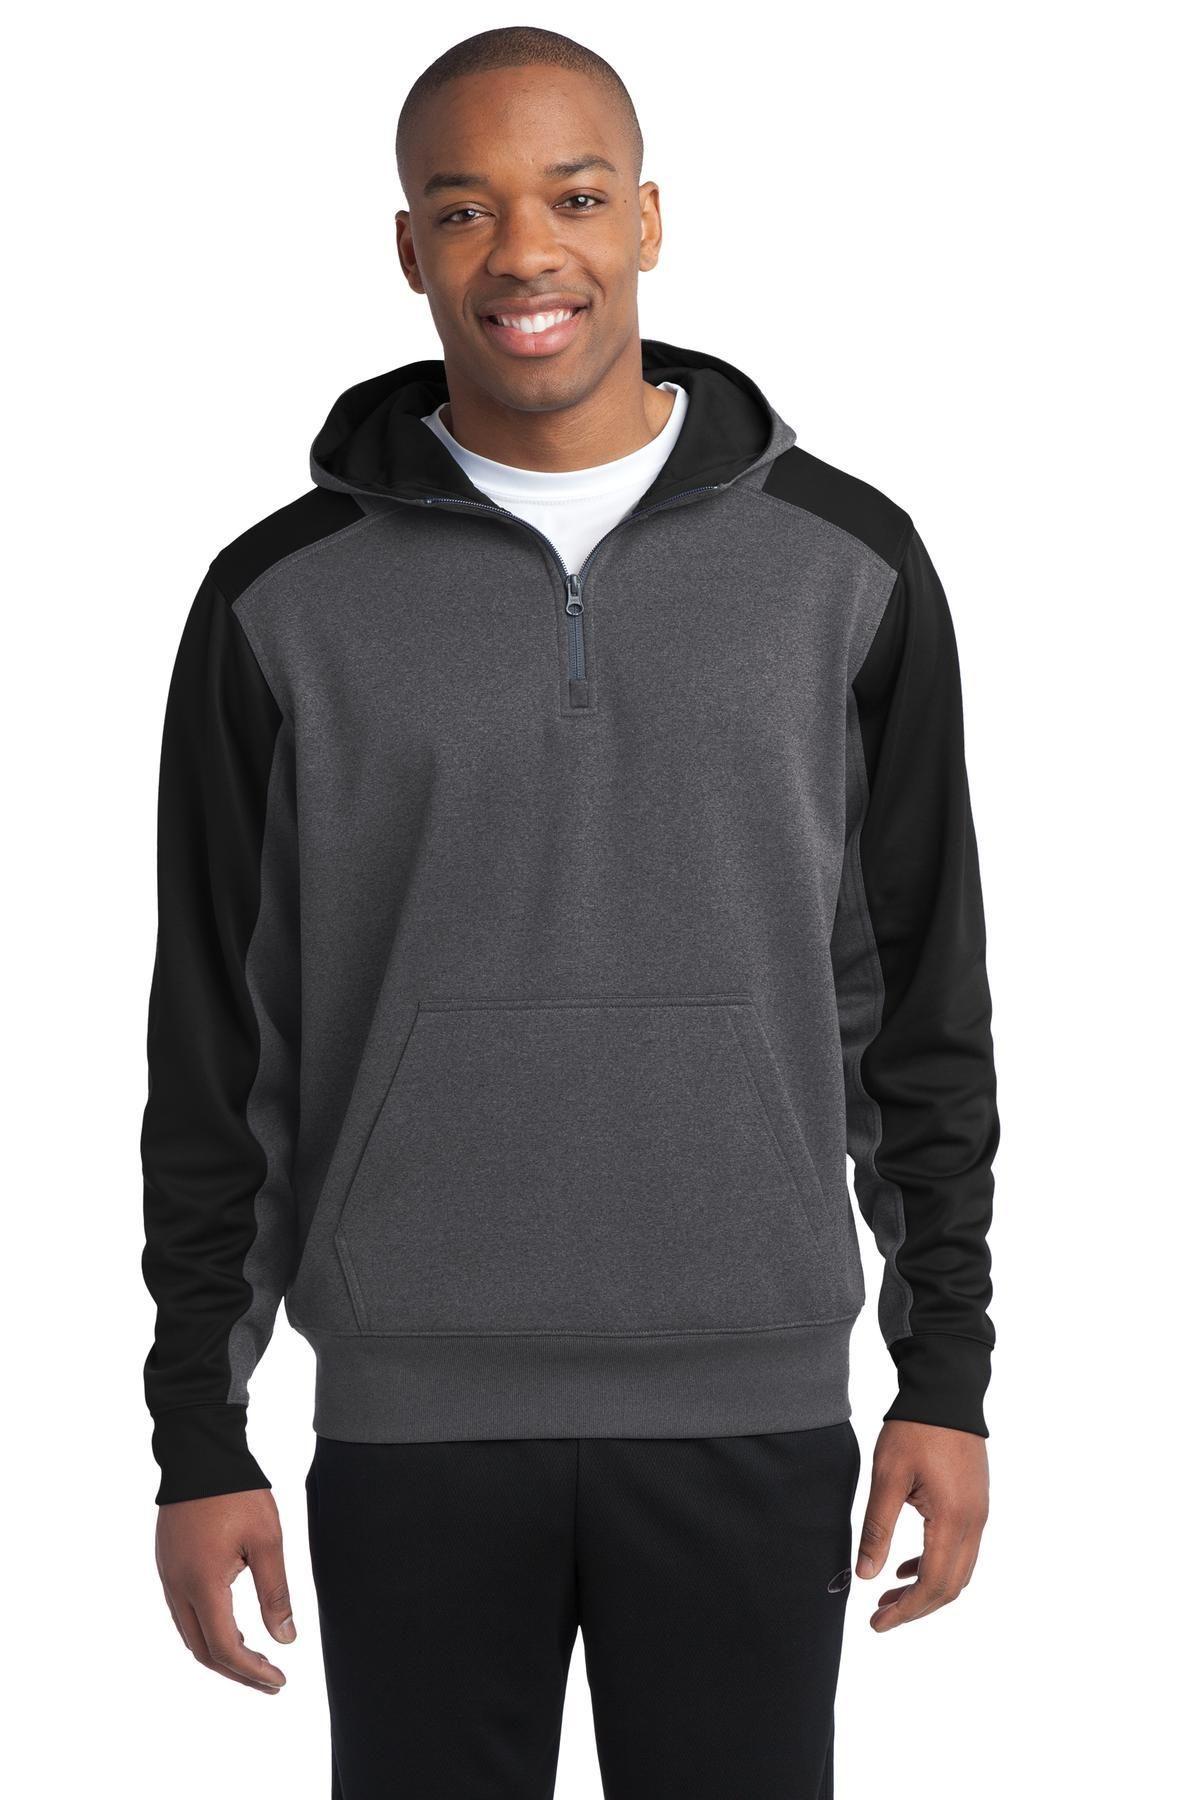 SportTek Tech Fleece Colorblock 1/4Zip Hooded Sweatshirt